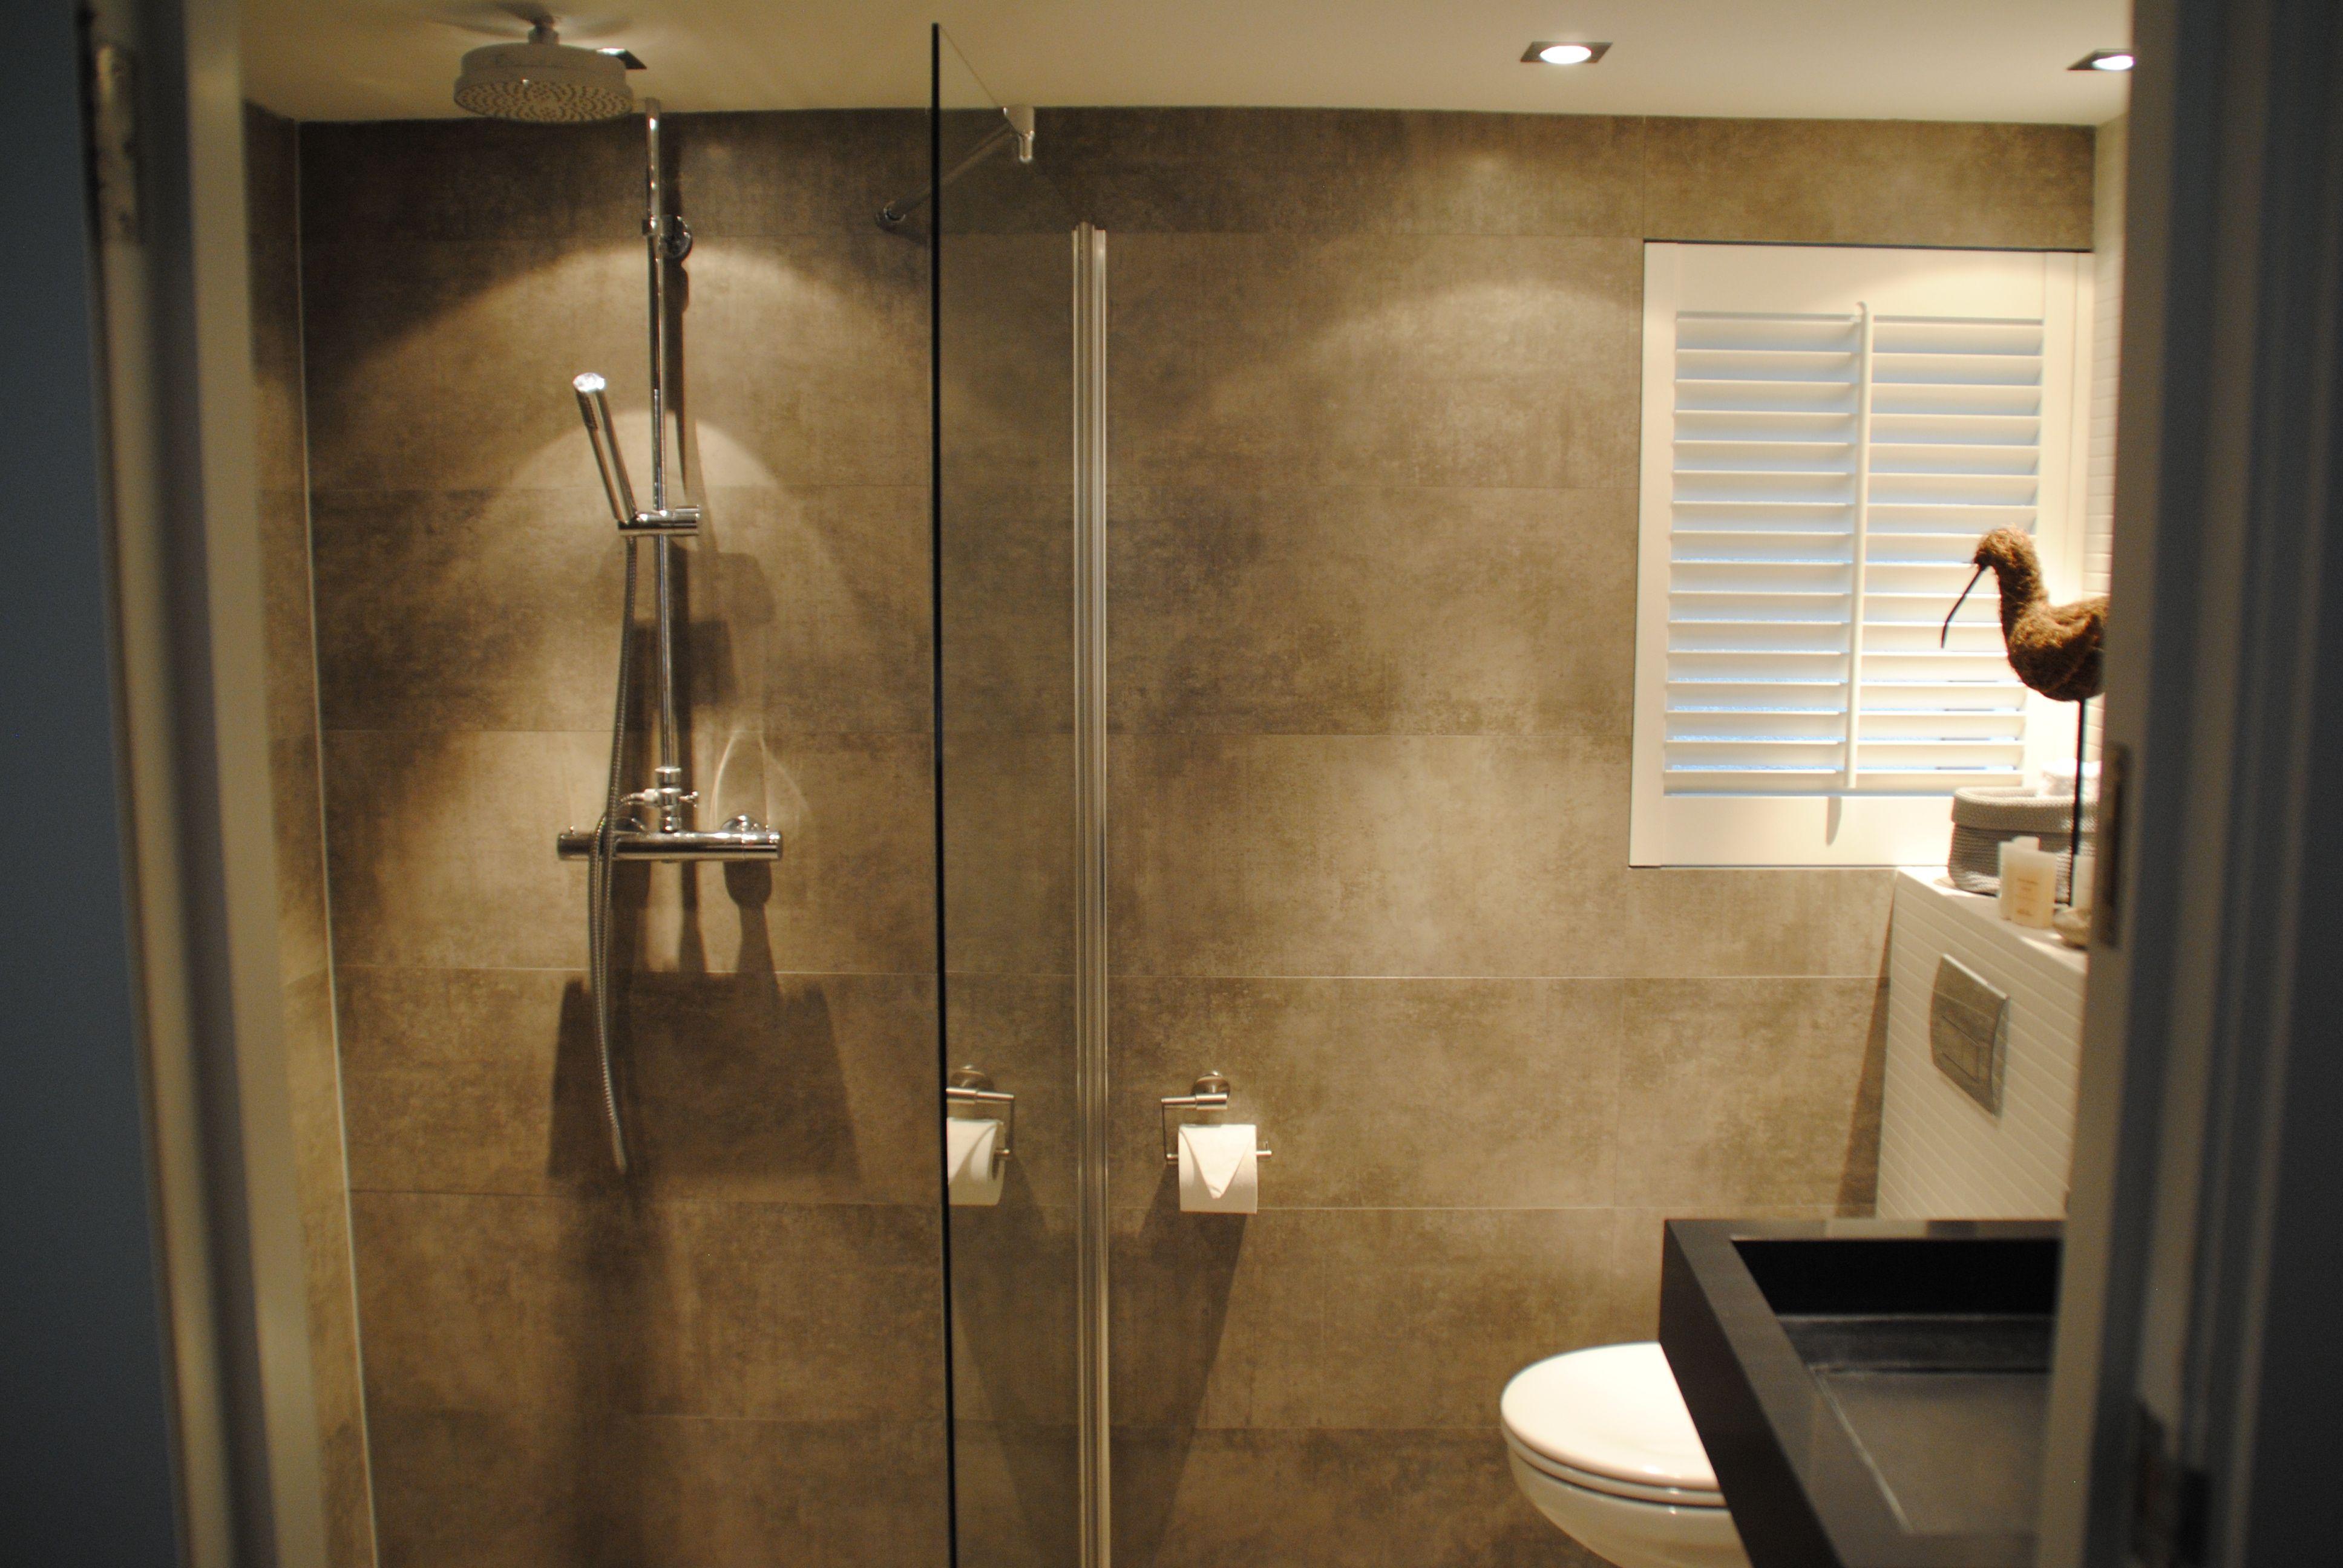 badkamer | Dorpsstraat 74 - Zoetermeer | Pinterest